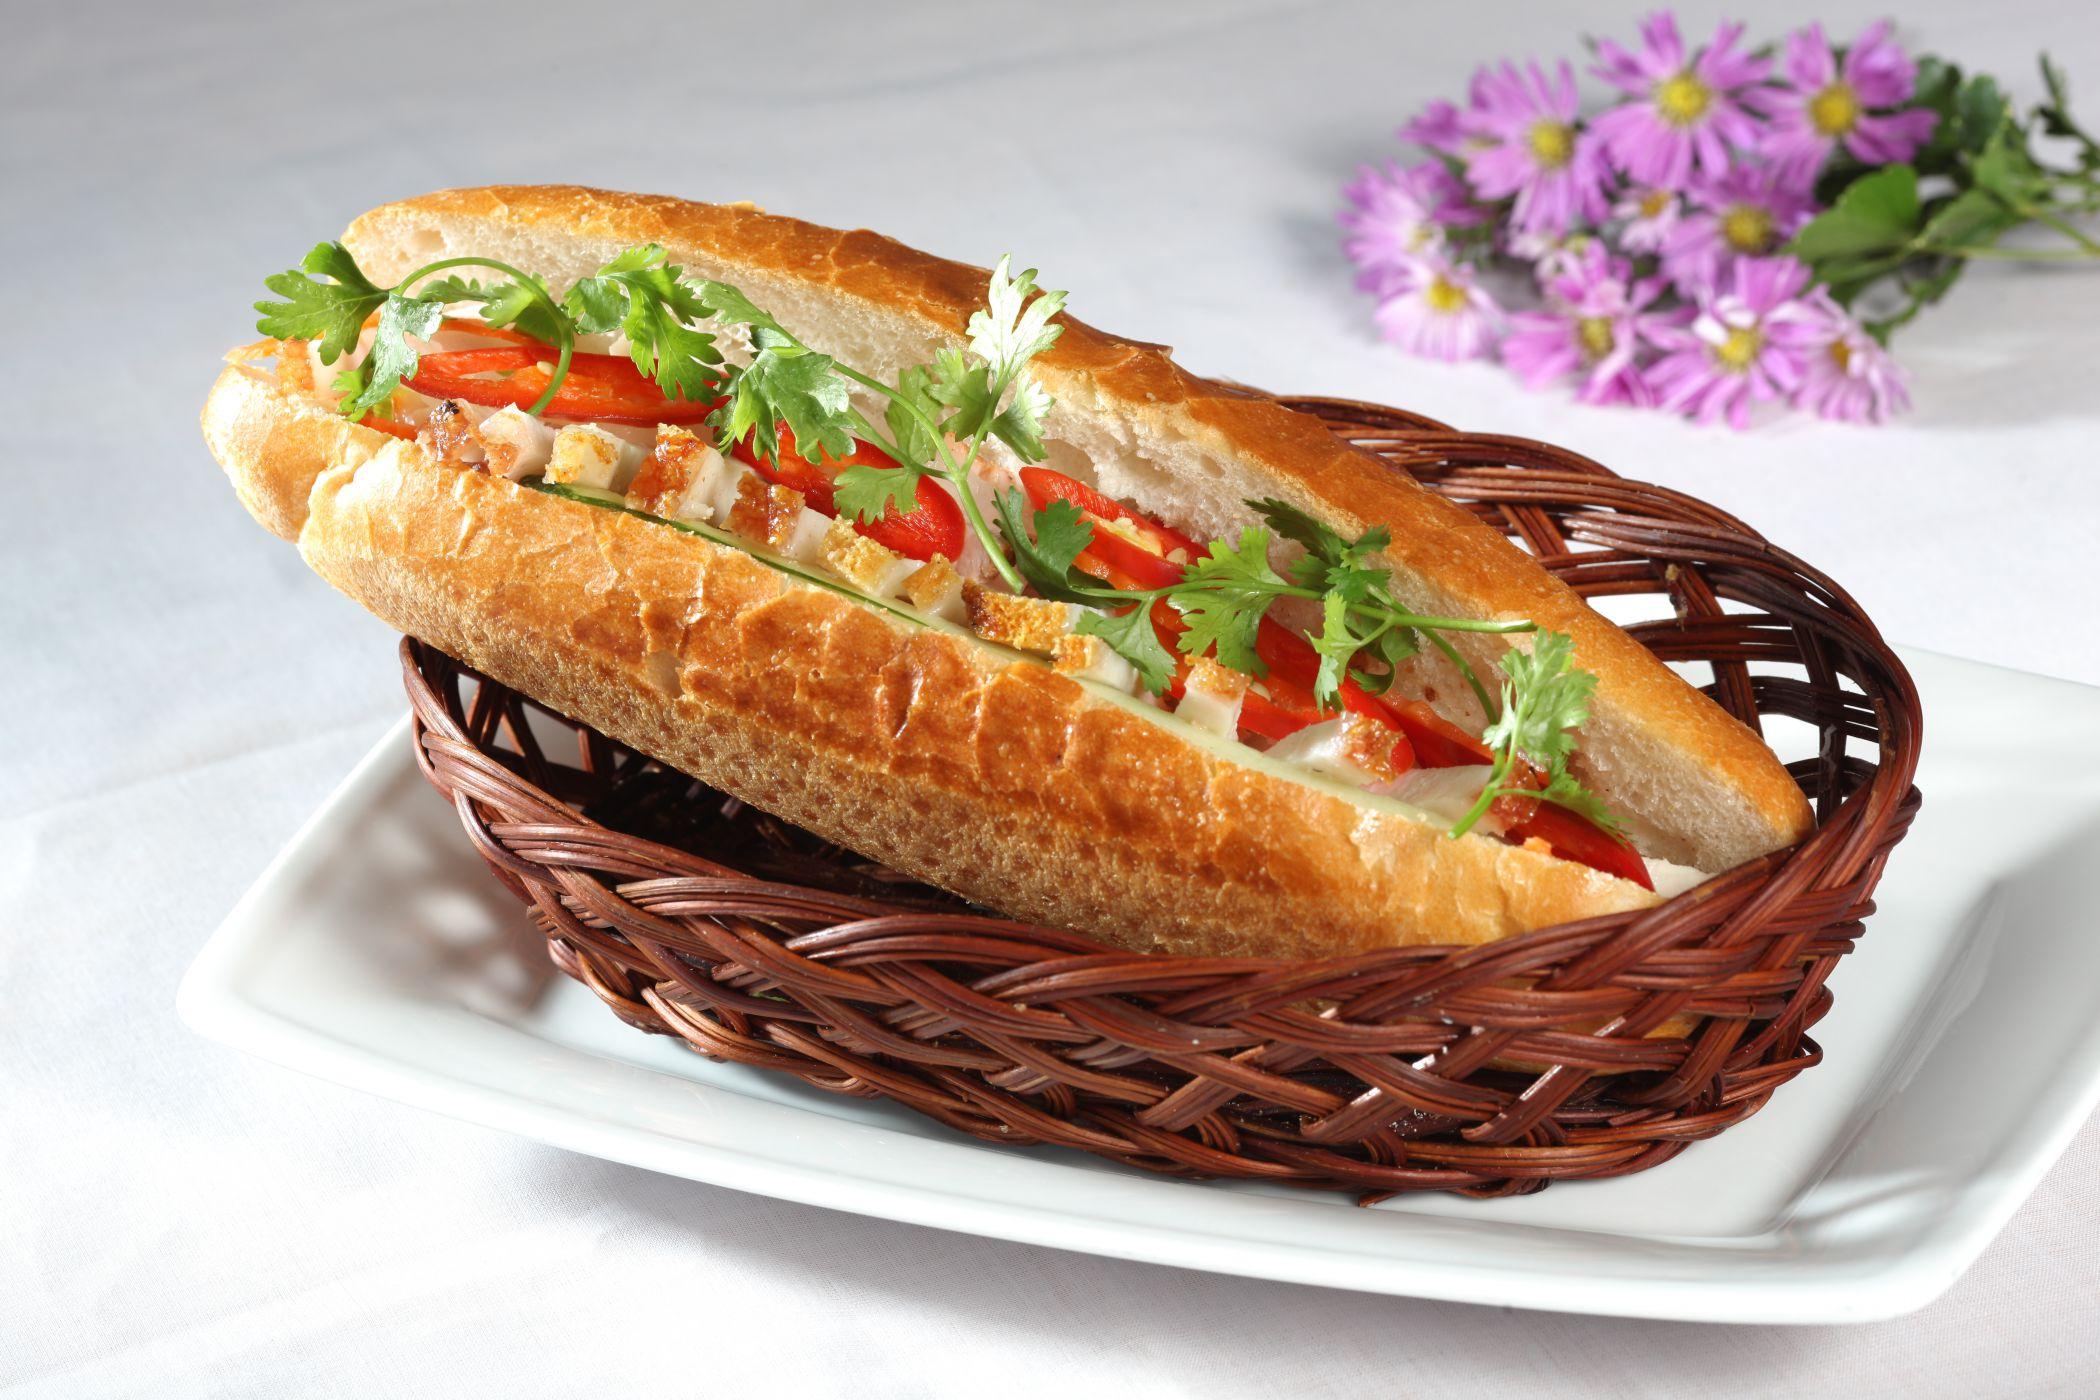 Halal food is served at Terminal 2 of Noi Bai airport - Yallavietnam